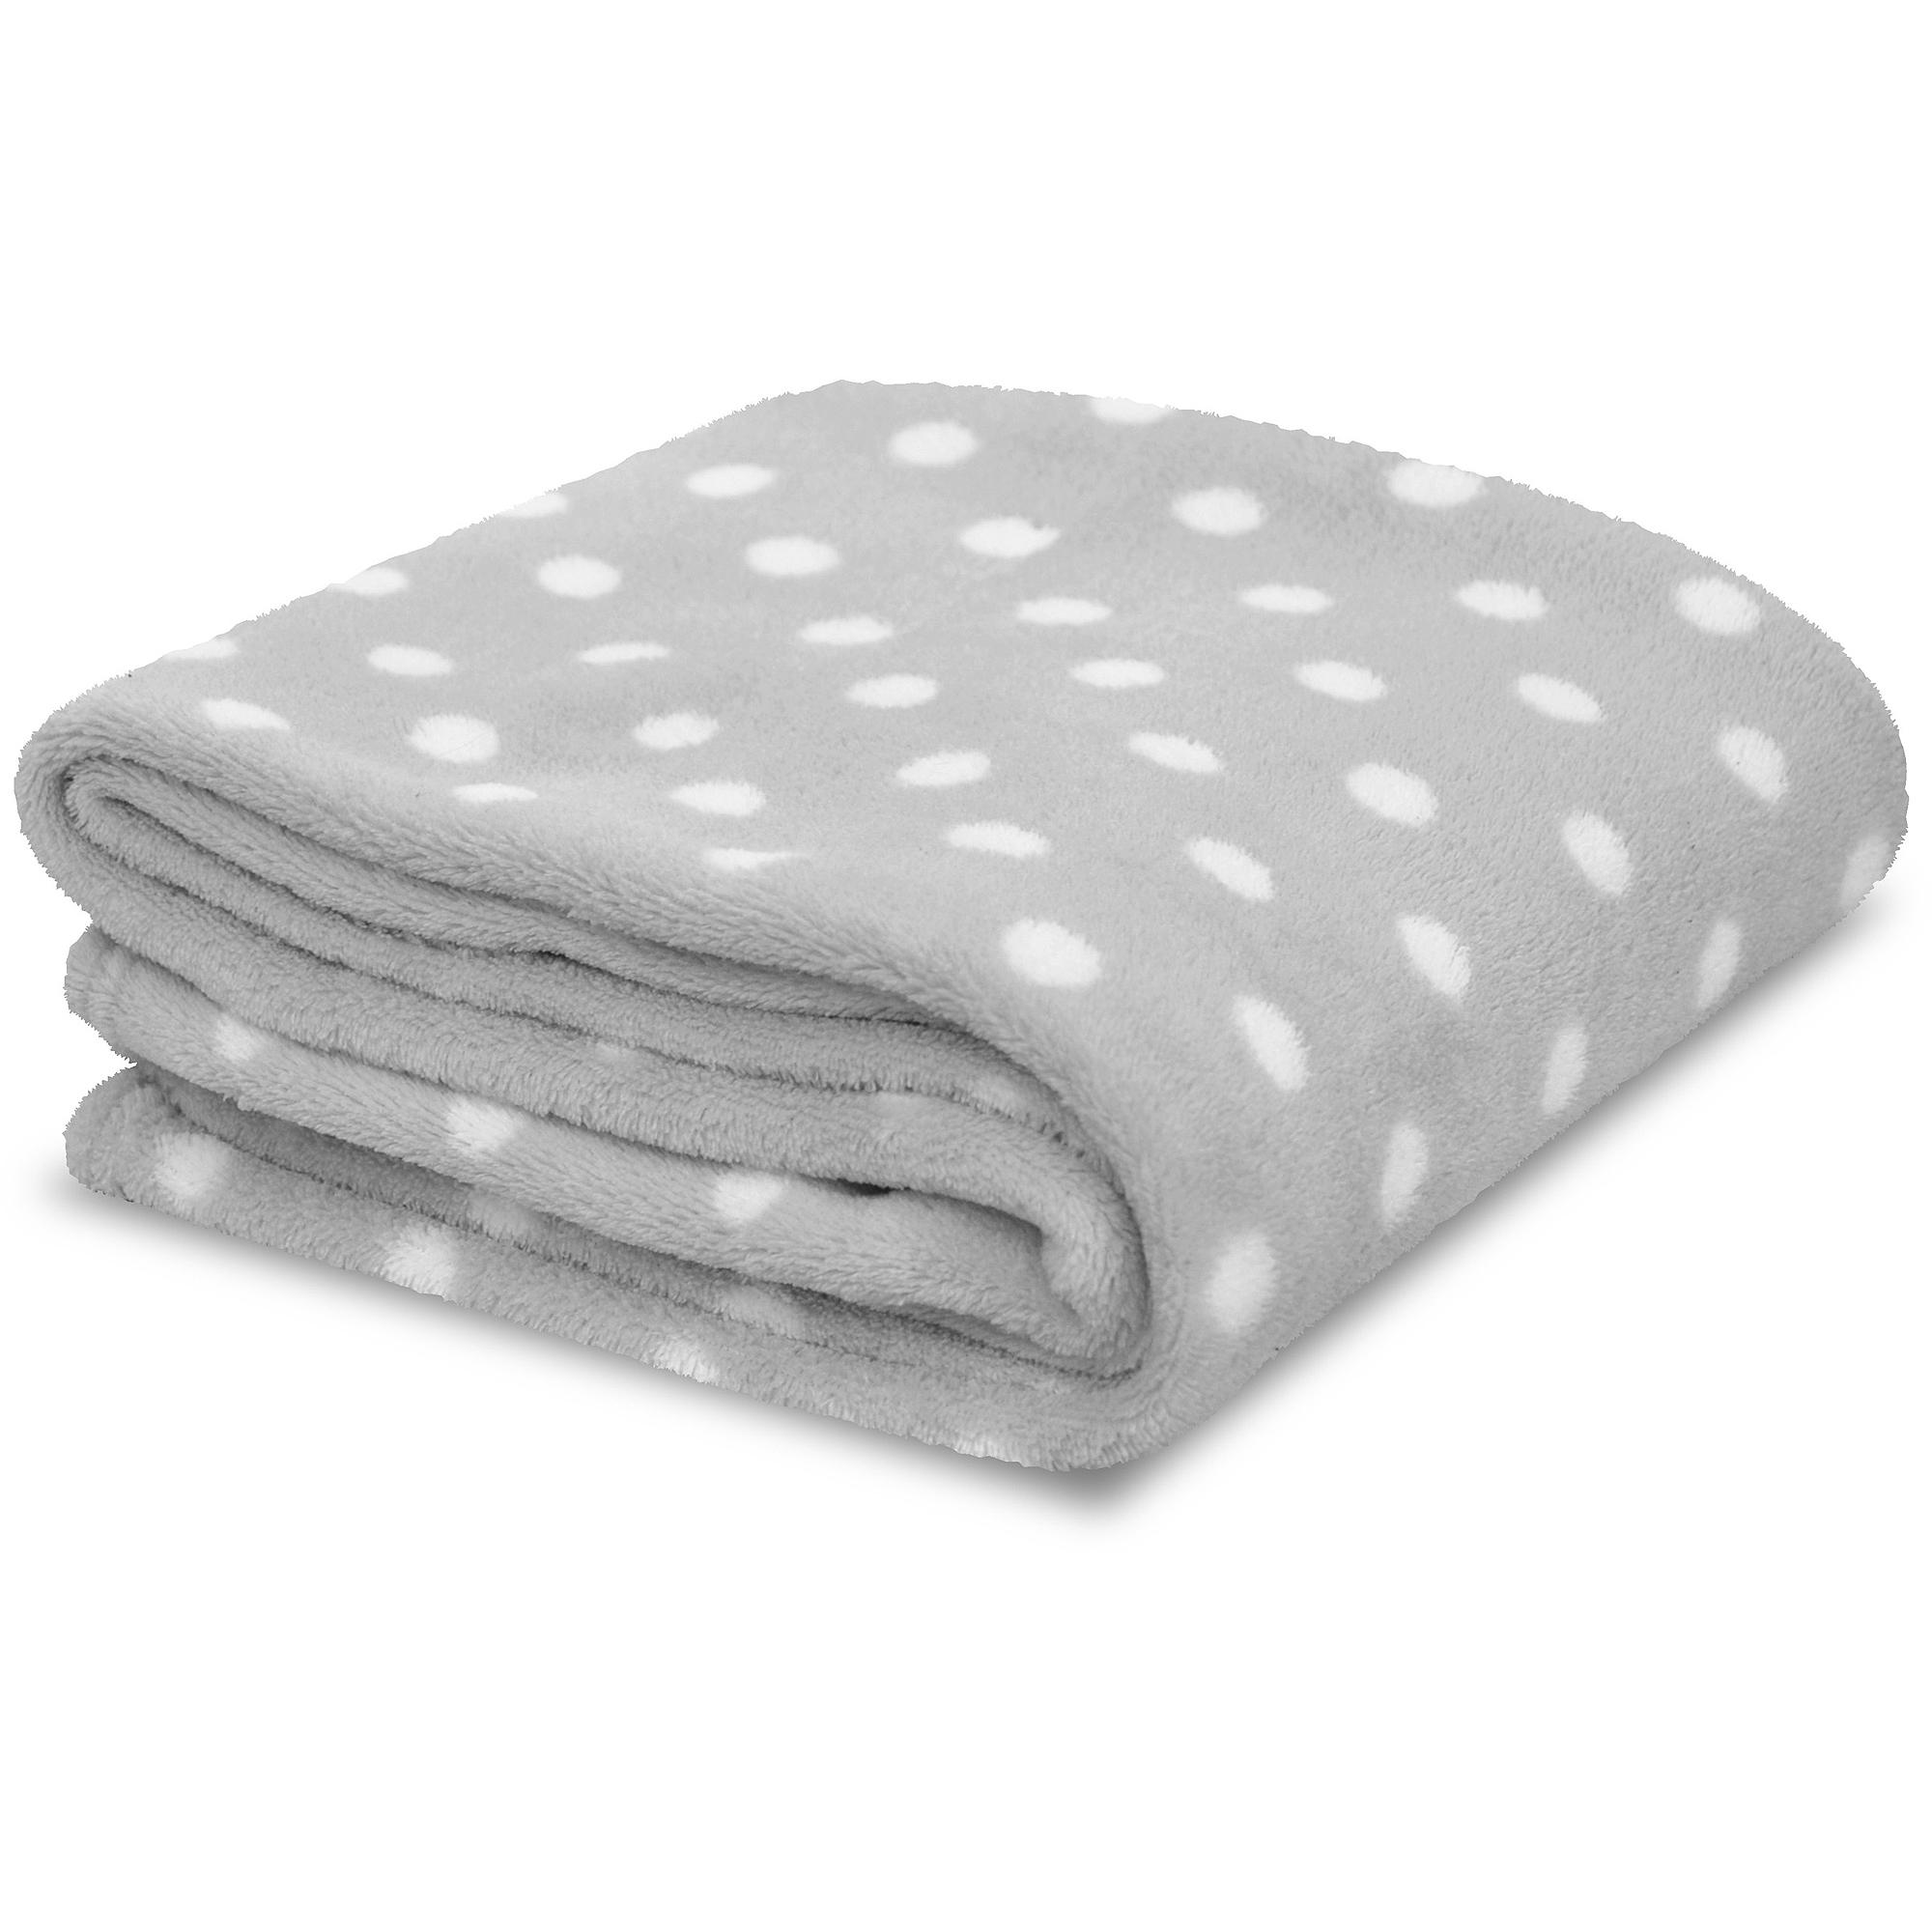 Blankets & Bedspreads